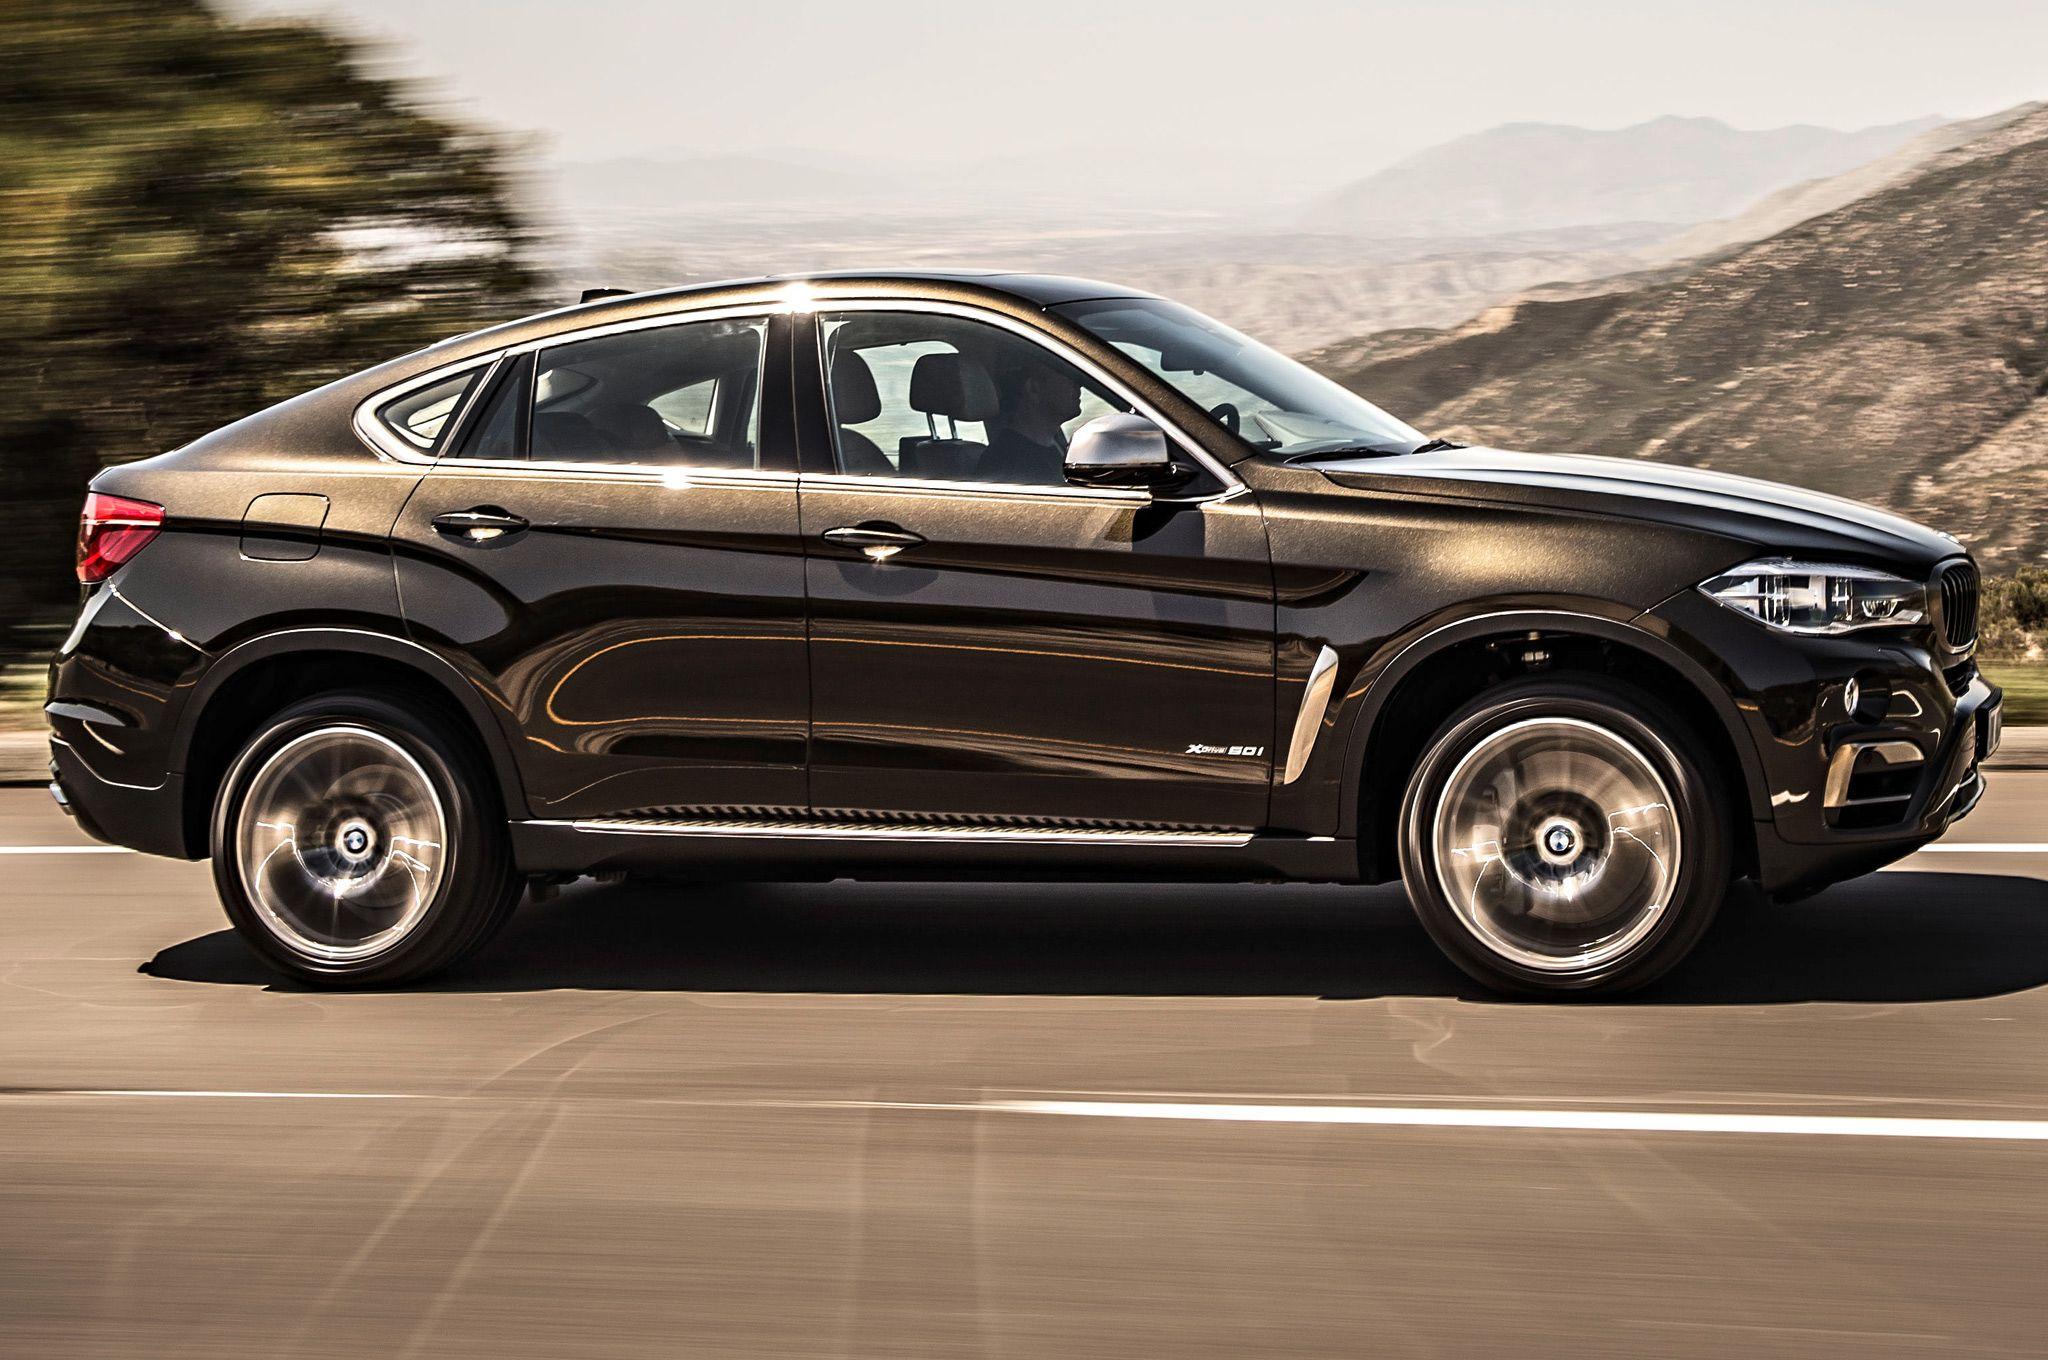 Best Car BMW X6 Reviews In LA Auto Show USA 2015